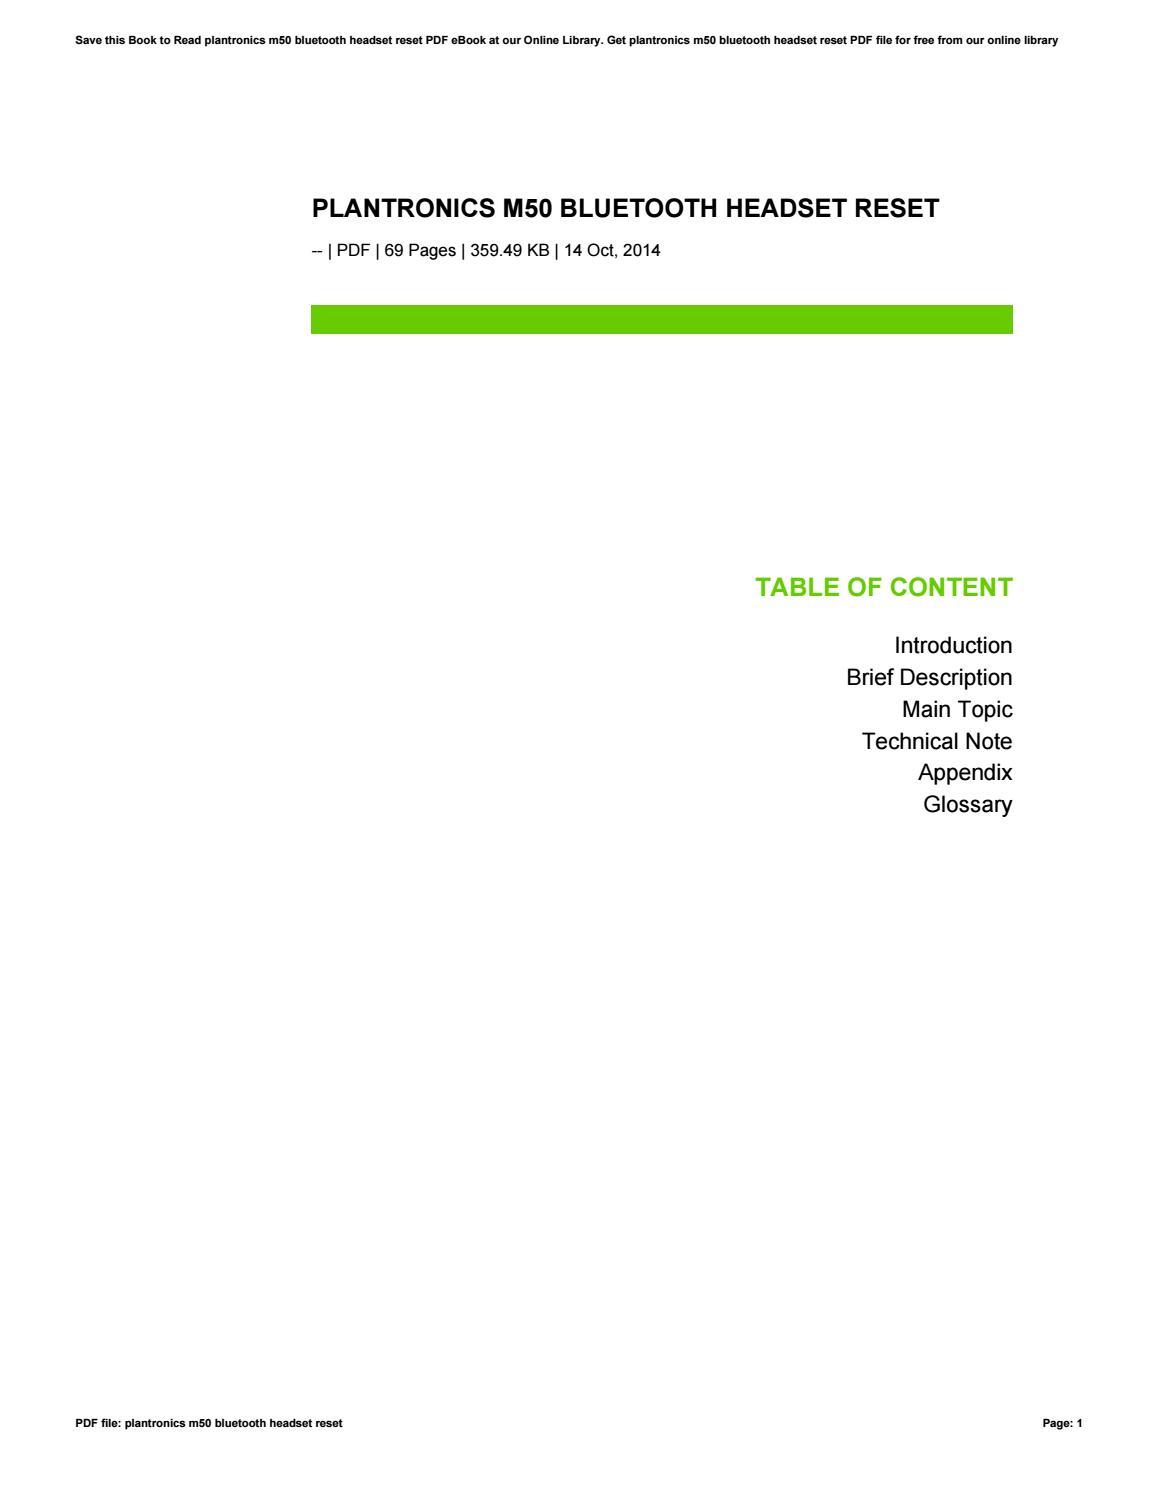 Plantronics m50-bluetooth-headset-reset.